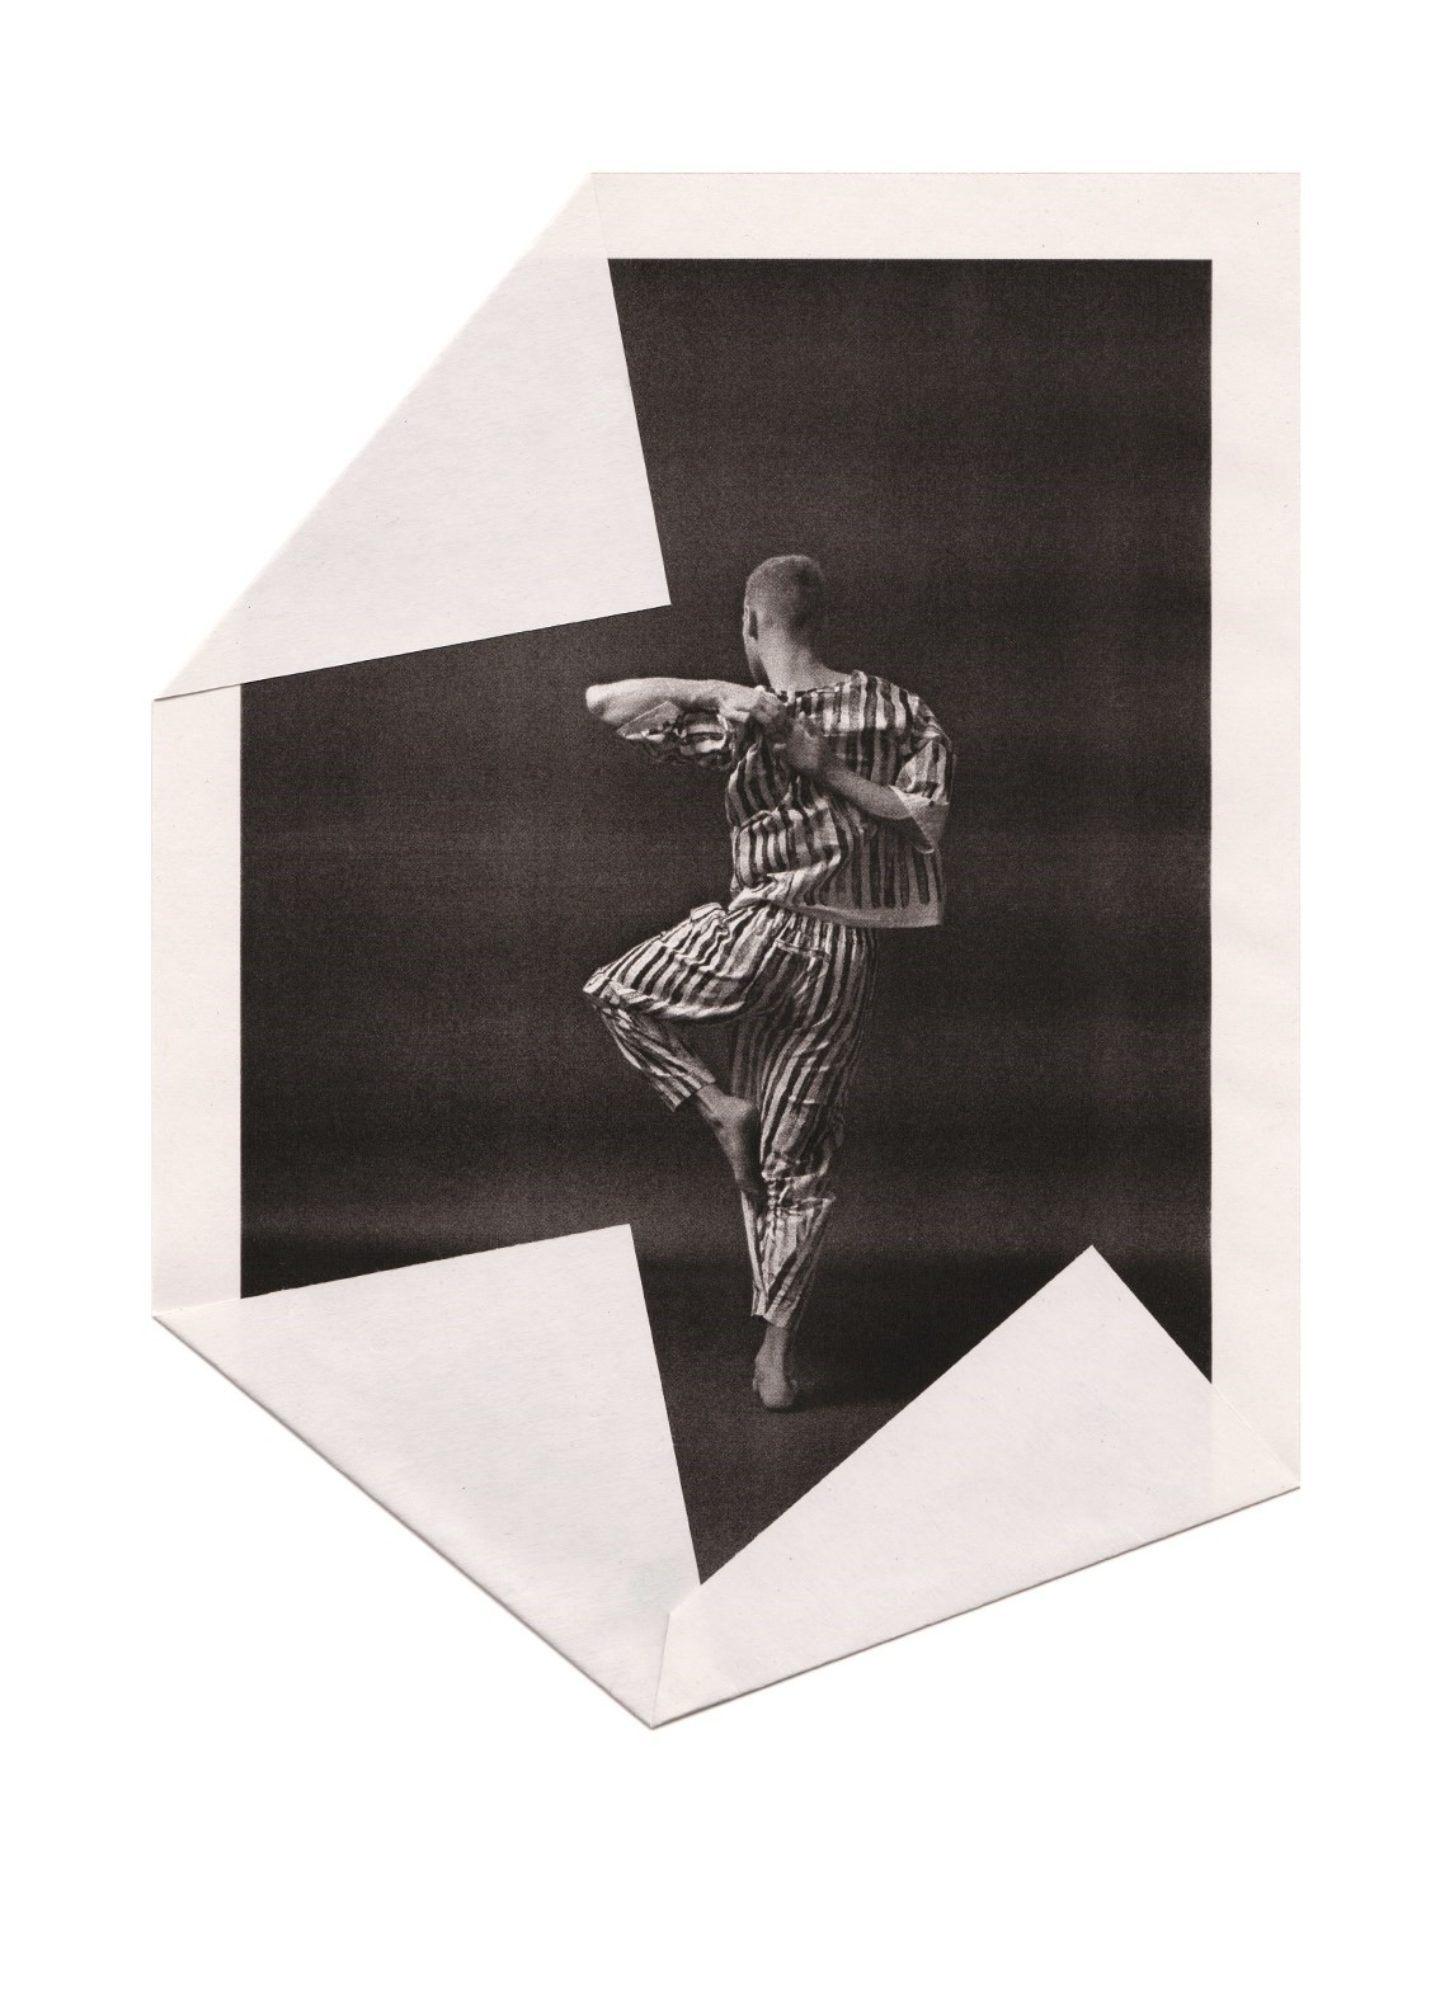 IGNANT-Art-Paul-Phung-Bruce-Usher-Dance-5